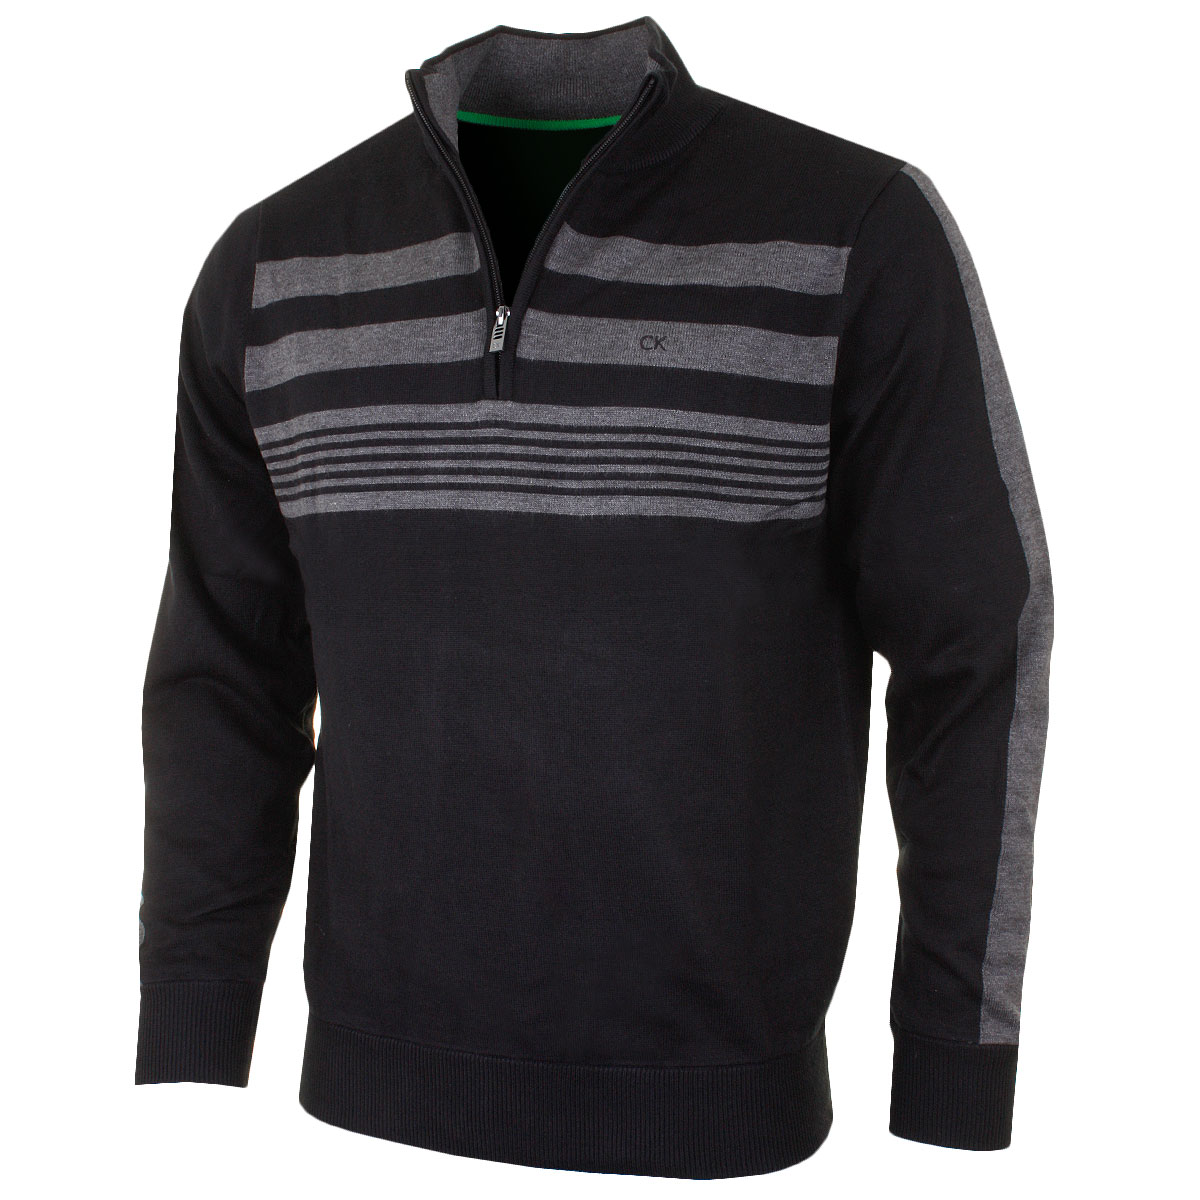 calvin klein golf 2016 mens ck stripeblock lined sweater. Black Bedroom Furniture Sets. Home Design Ideas